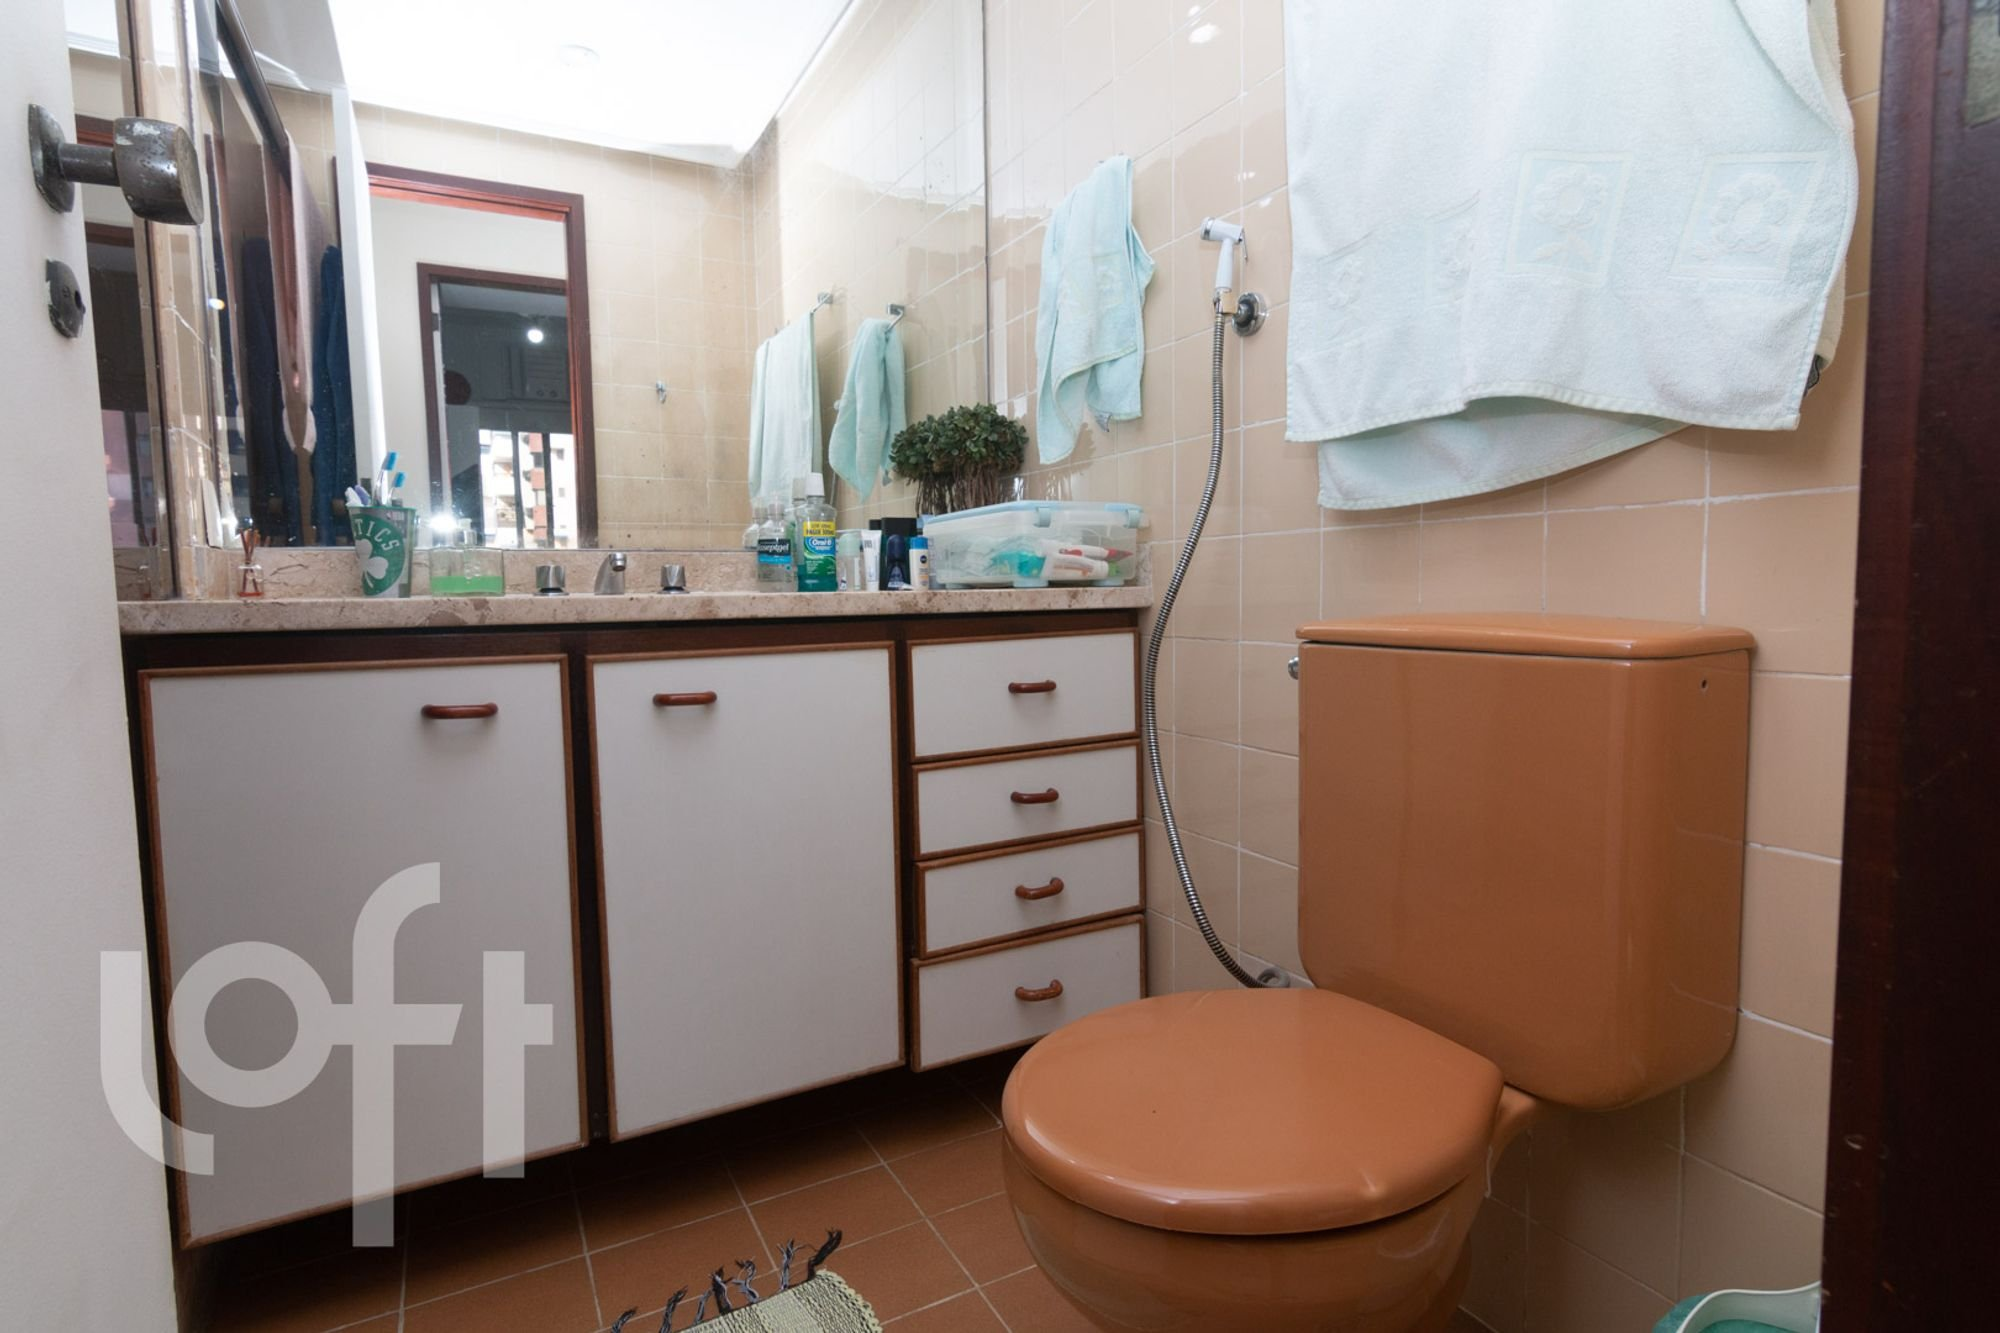 Foto de Banheiro com vaso de planta, vaso sanitário, garrafa